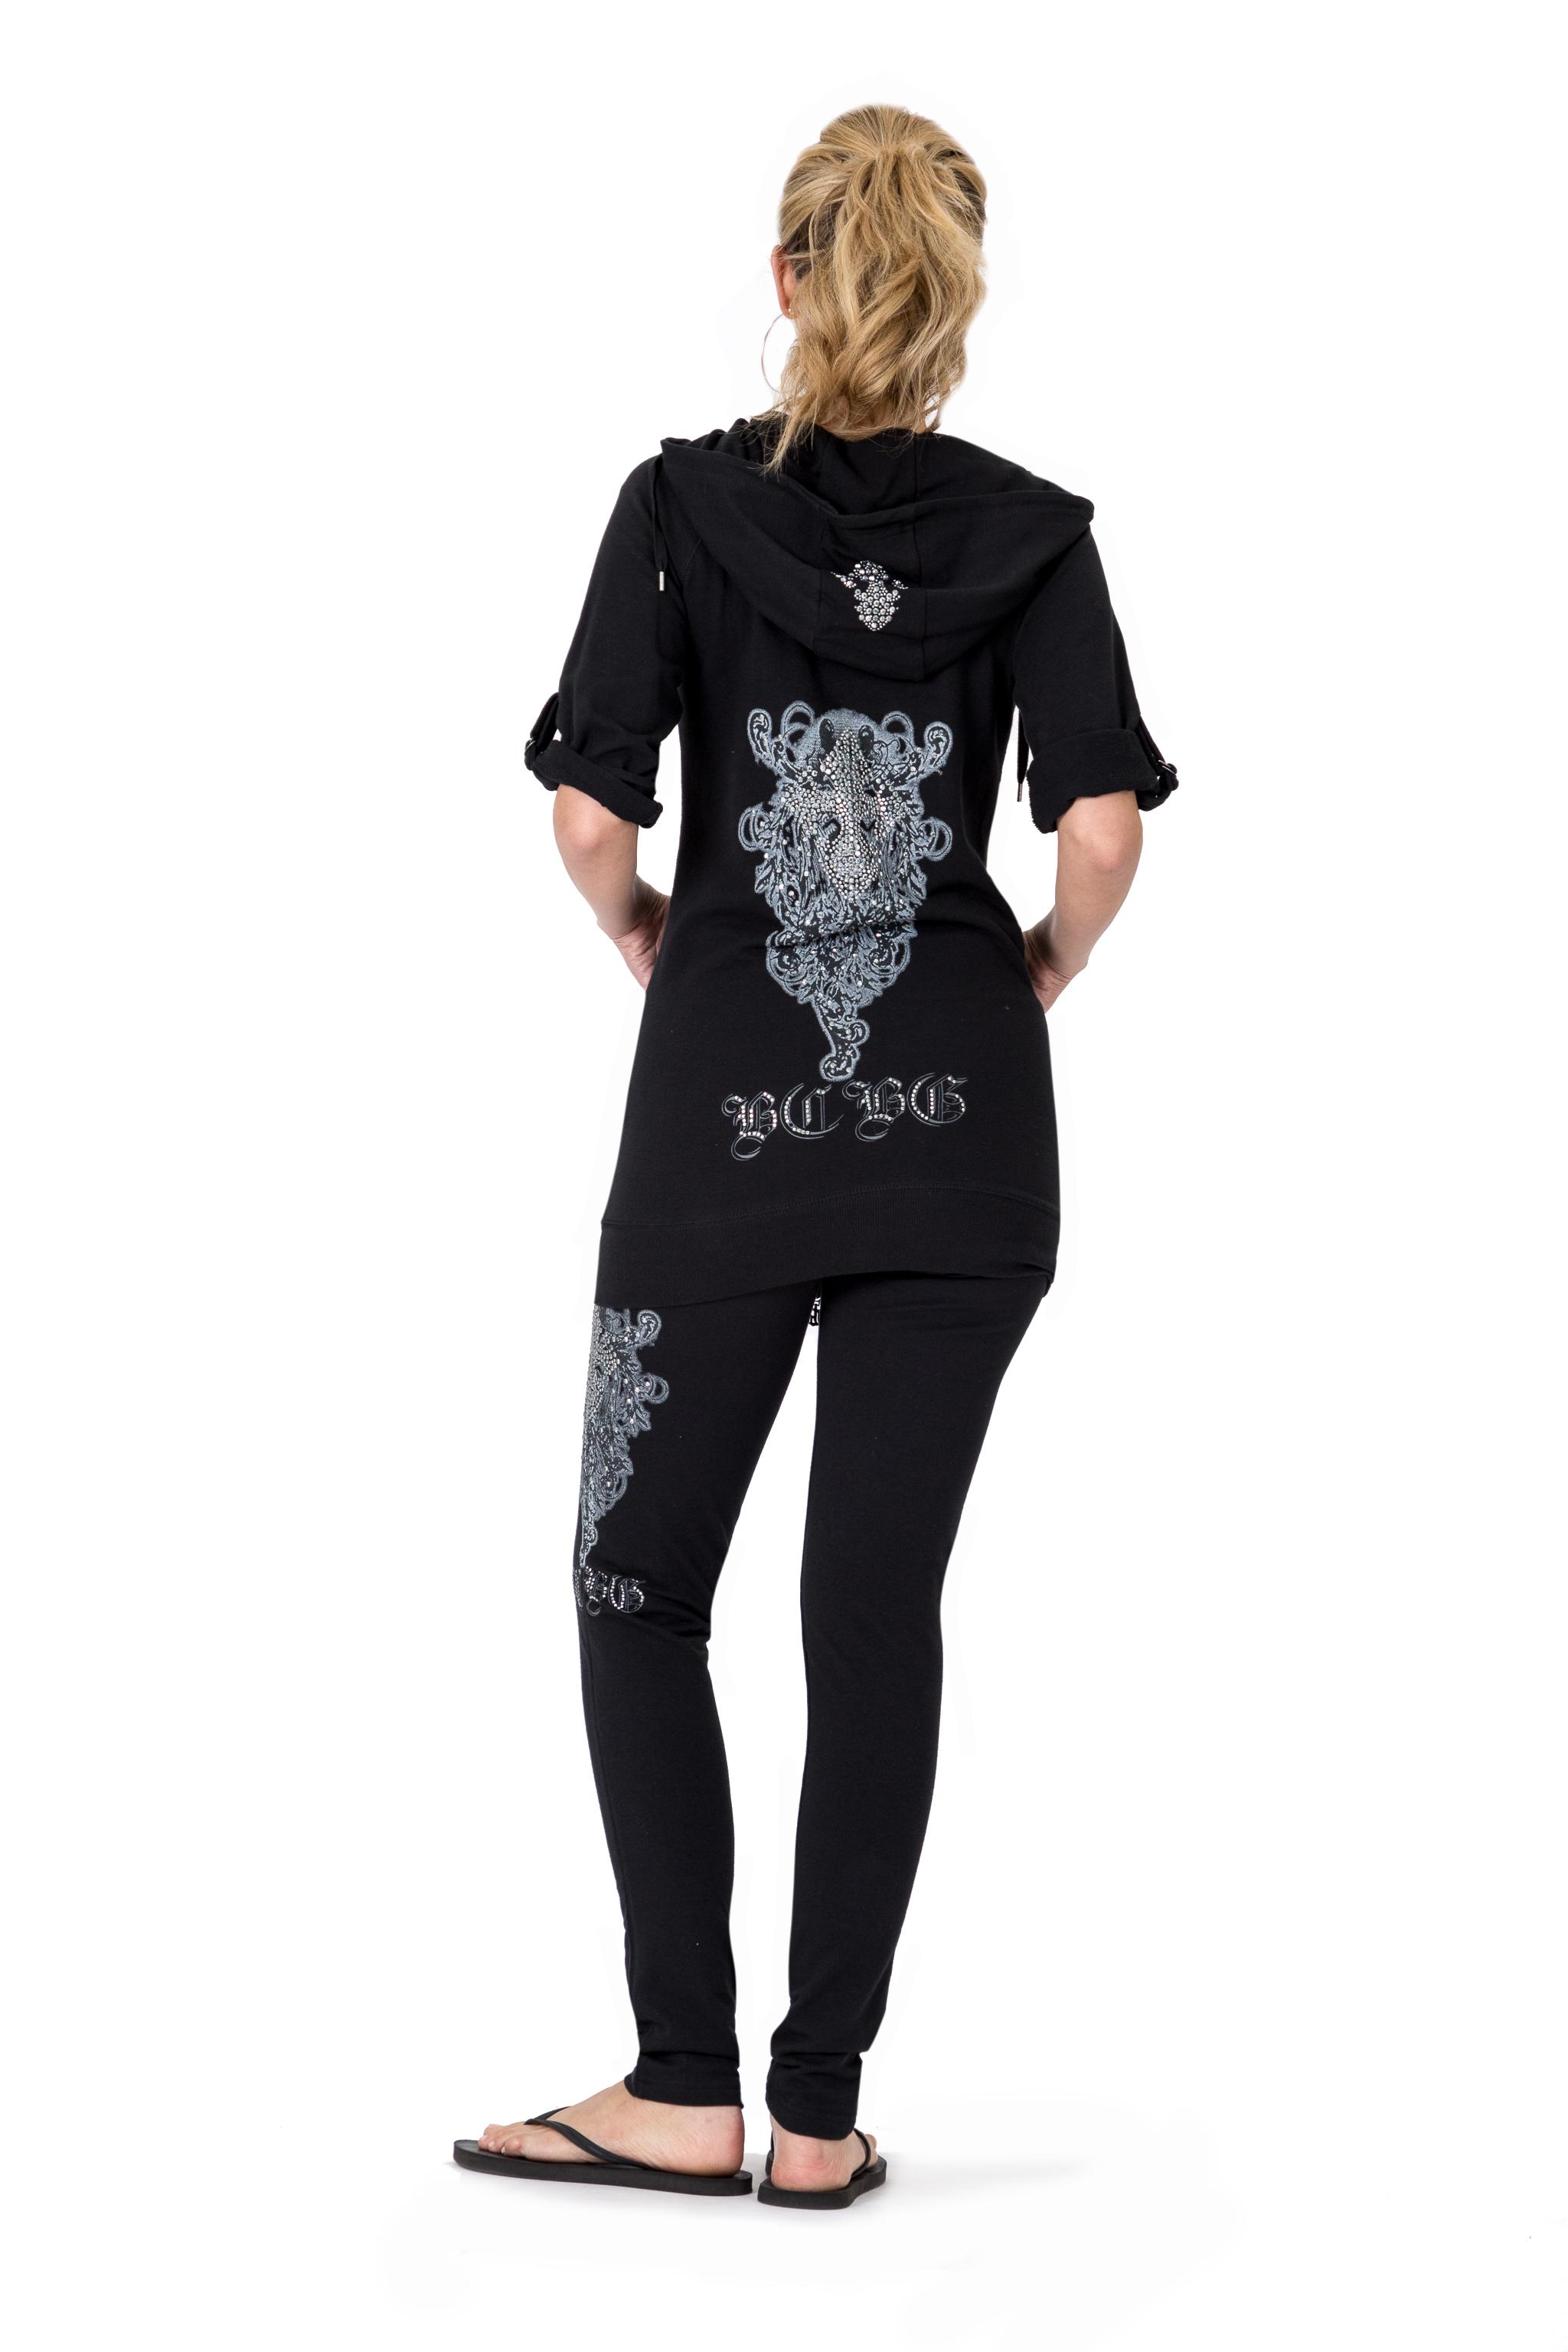 BCBG-Women-039-s-Lounge-Wear-2-Piece-Embellished-Jacket-and-Pants-Jogger-Set thumbnail 6